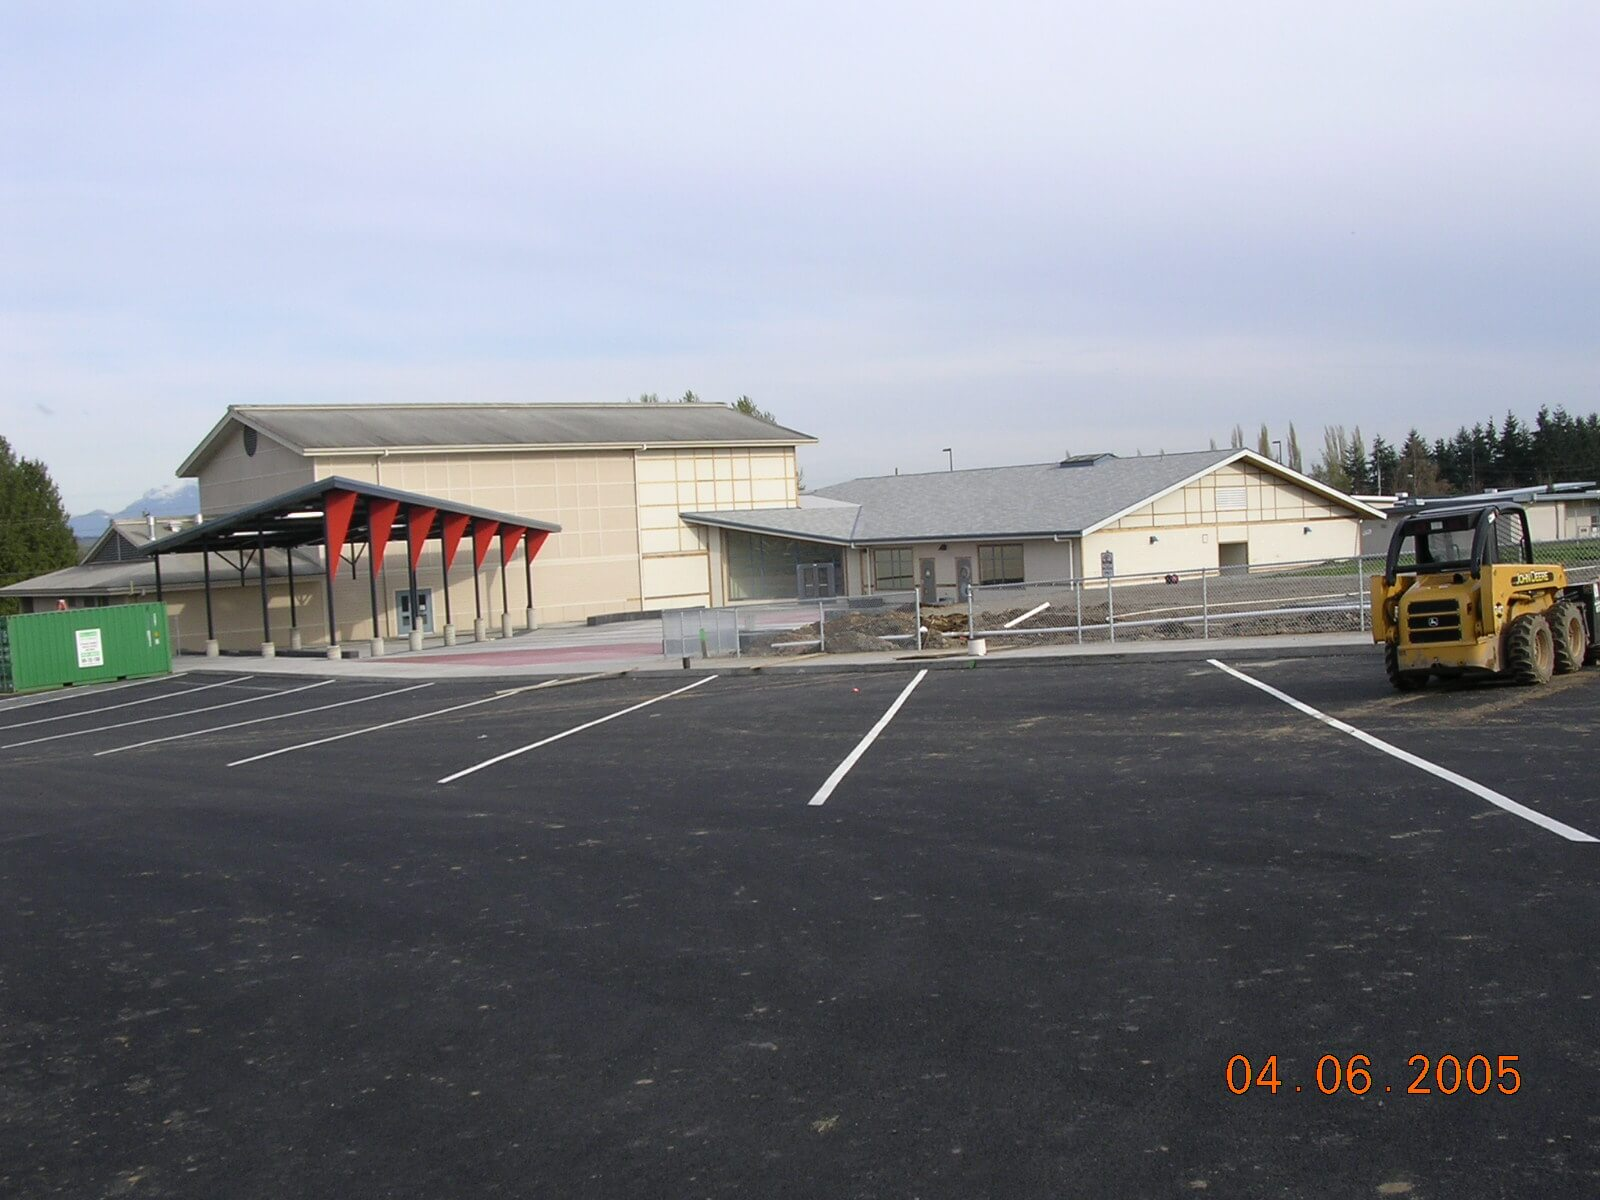 2005-04-06_001